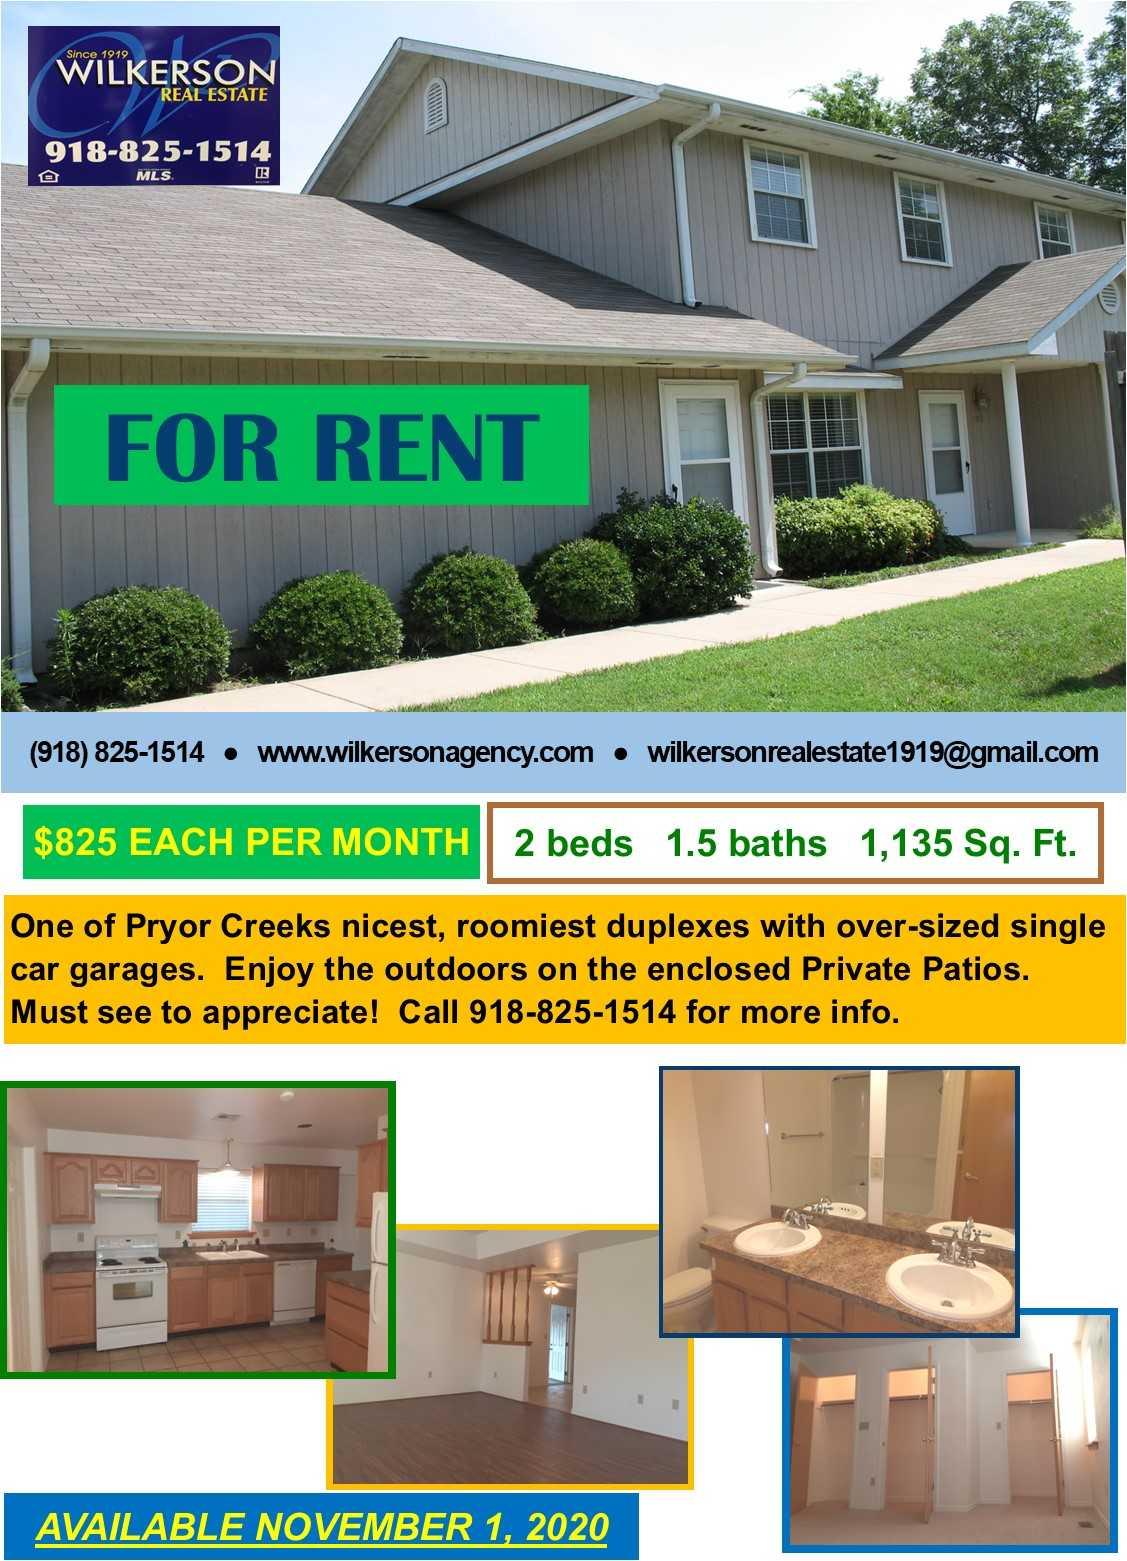 Property for Rent | Rental #15 Premium Senior Living Pryor, OK 74361 2